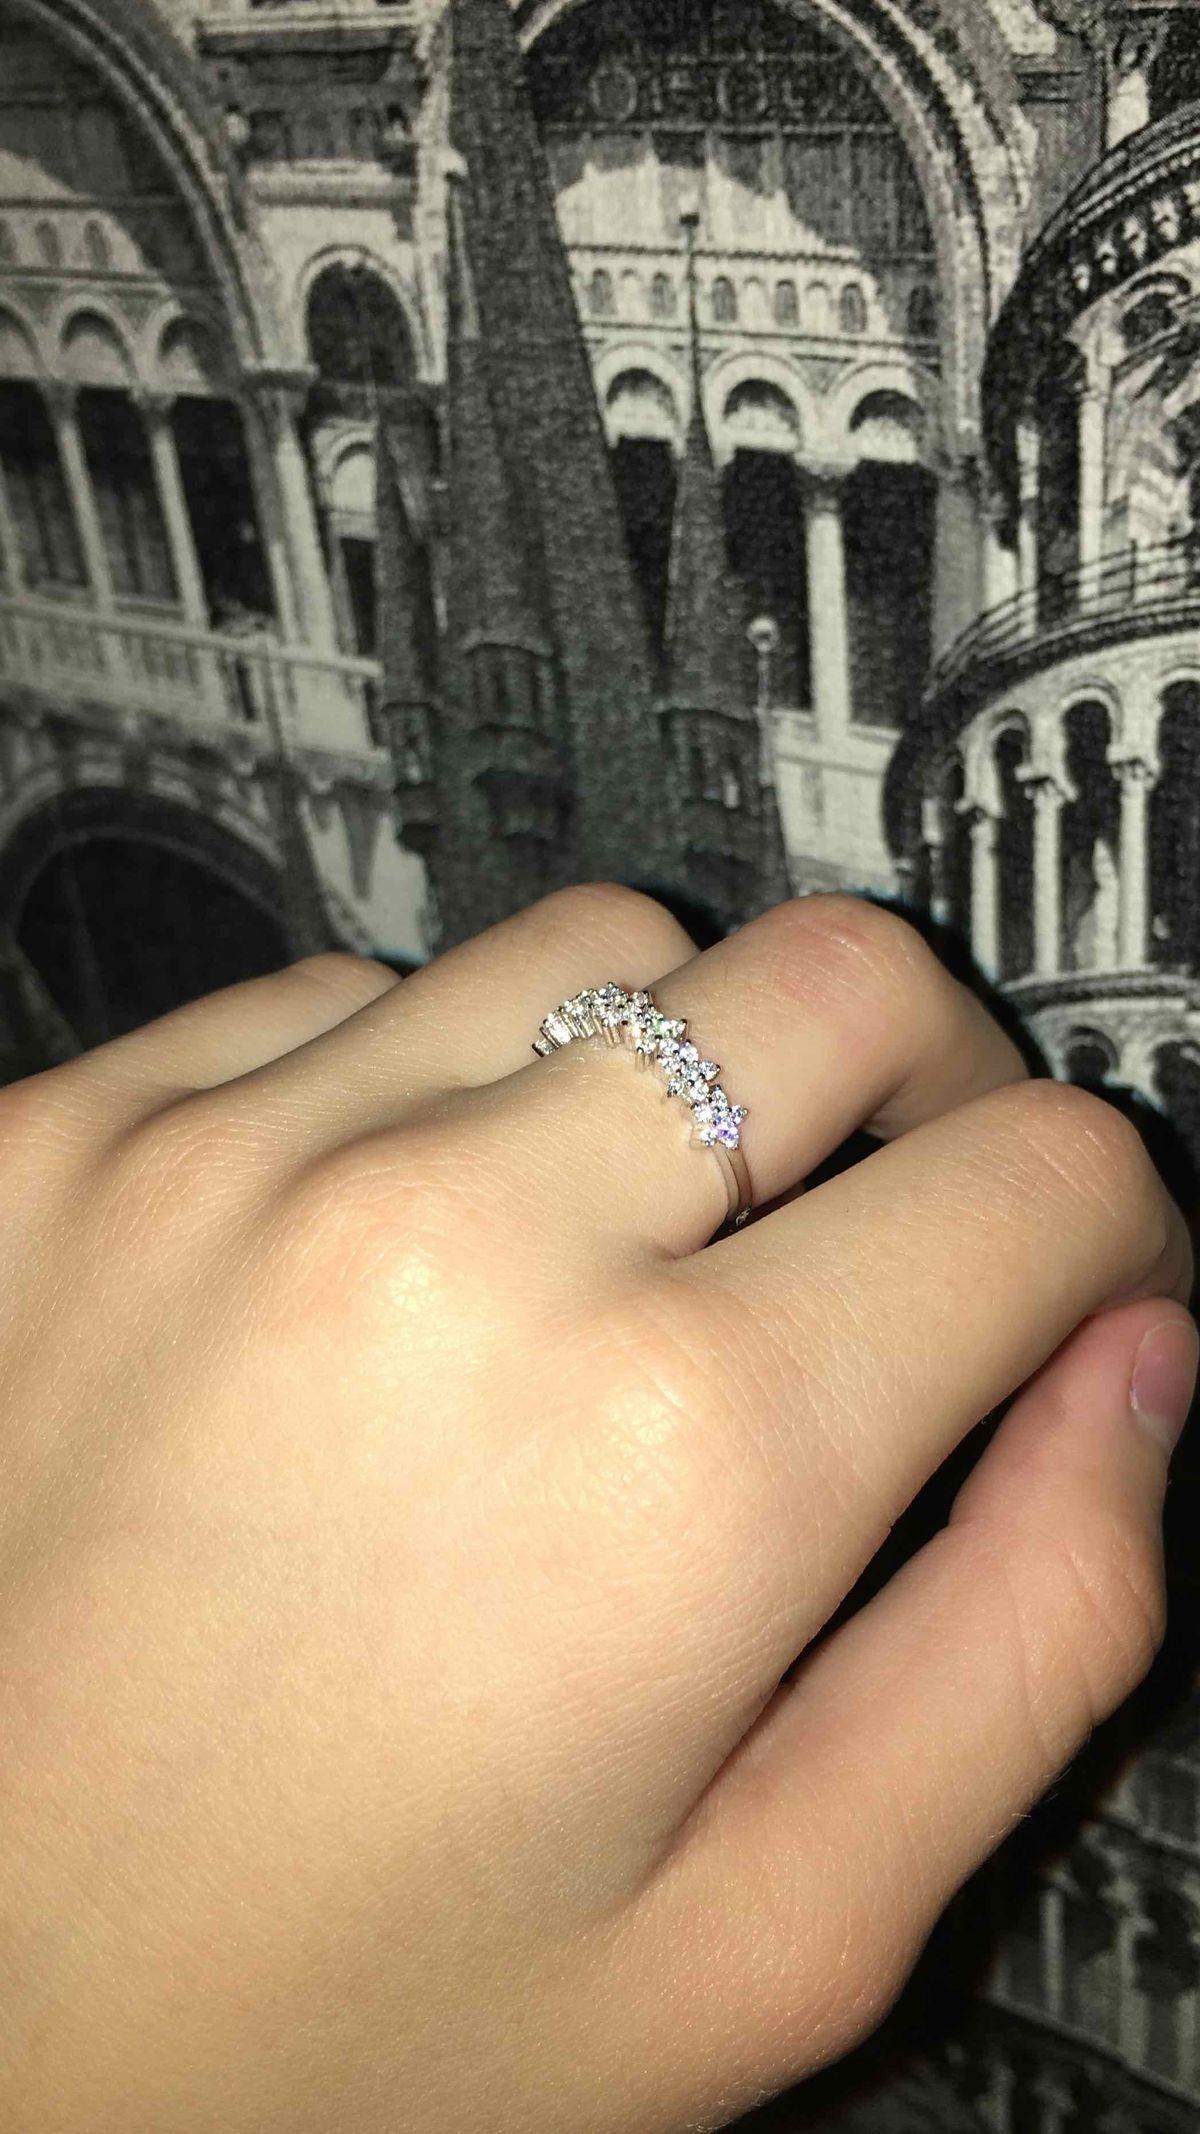 Супер классное кольцо!